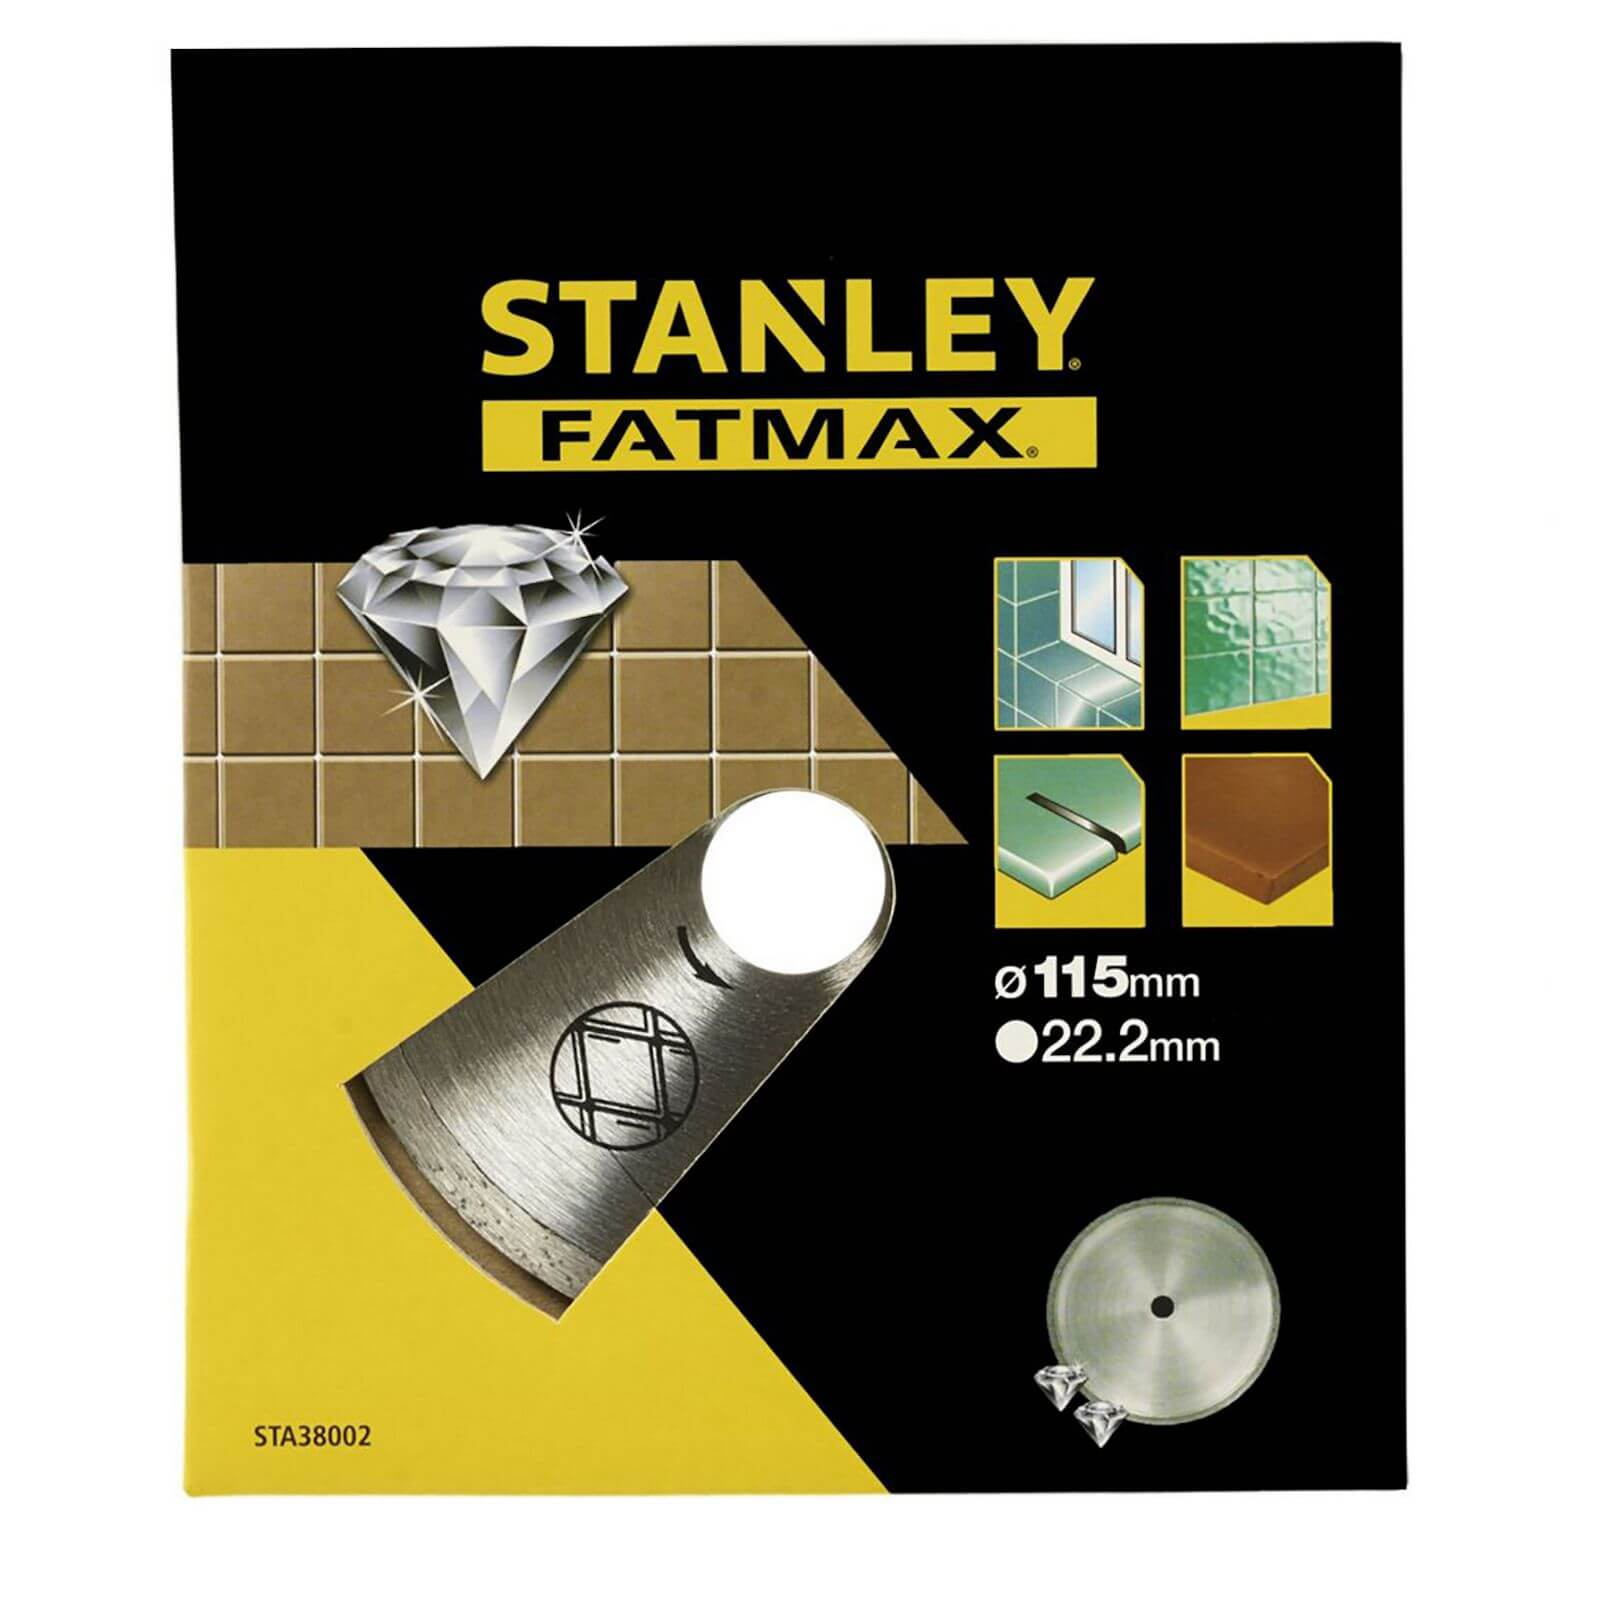 Stanley Fatmax Diamond Disc 115mm Cont Rim - STA38002-XJ